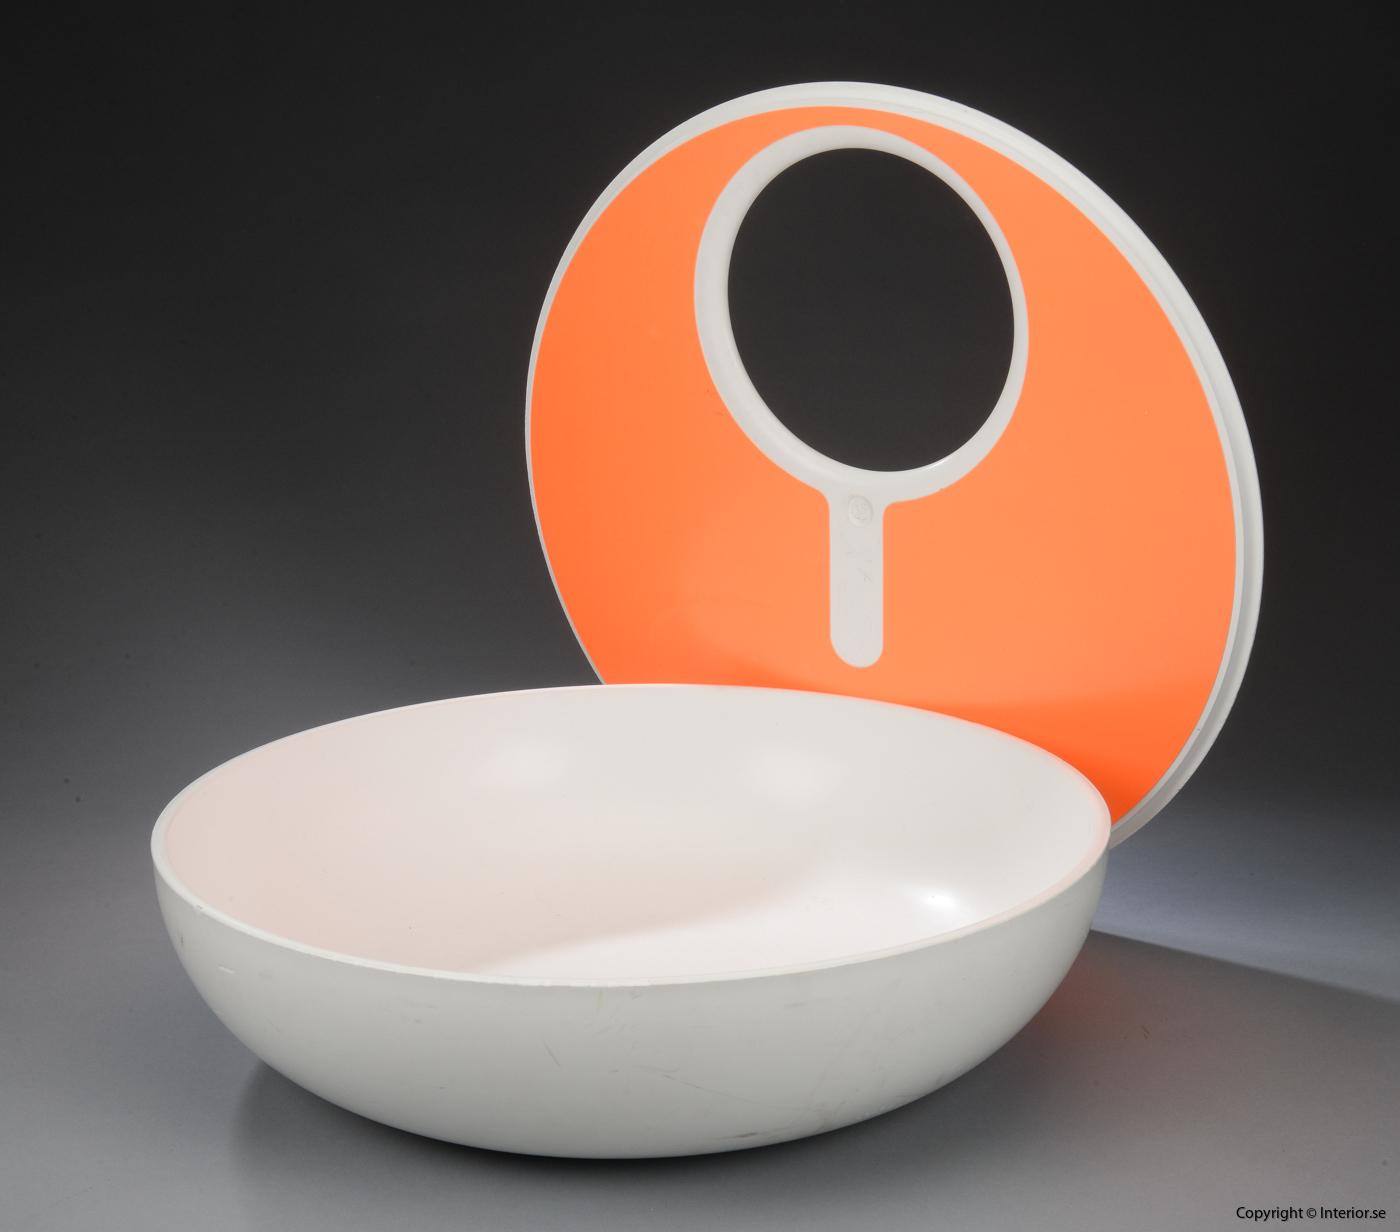 Soffbord coffee table Couchtisch  Alias Nesting - Tamar Ben David 2